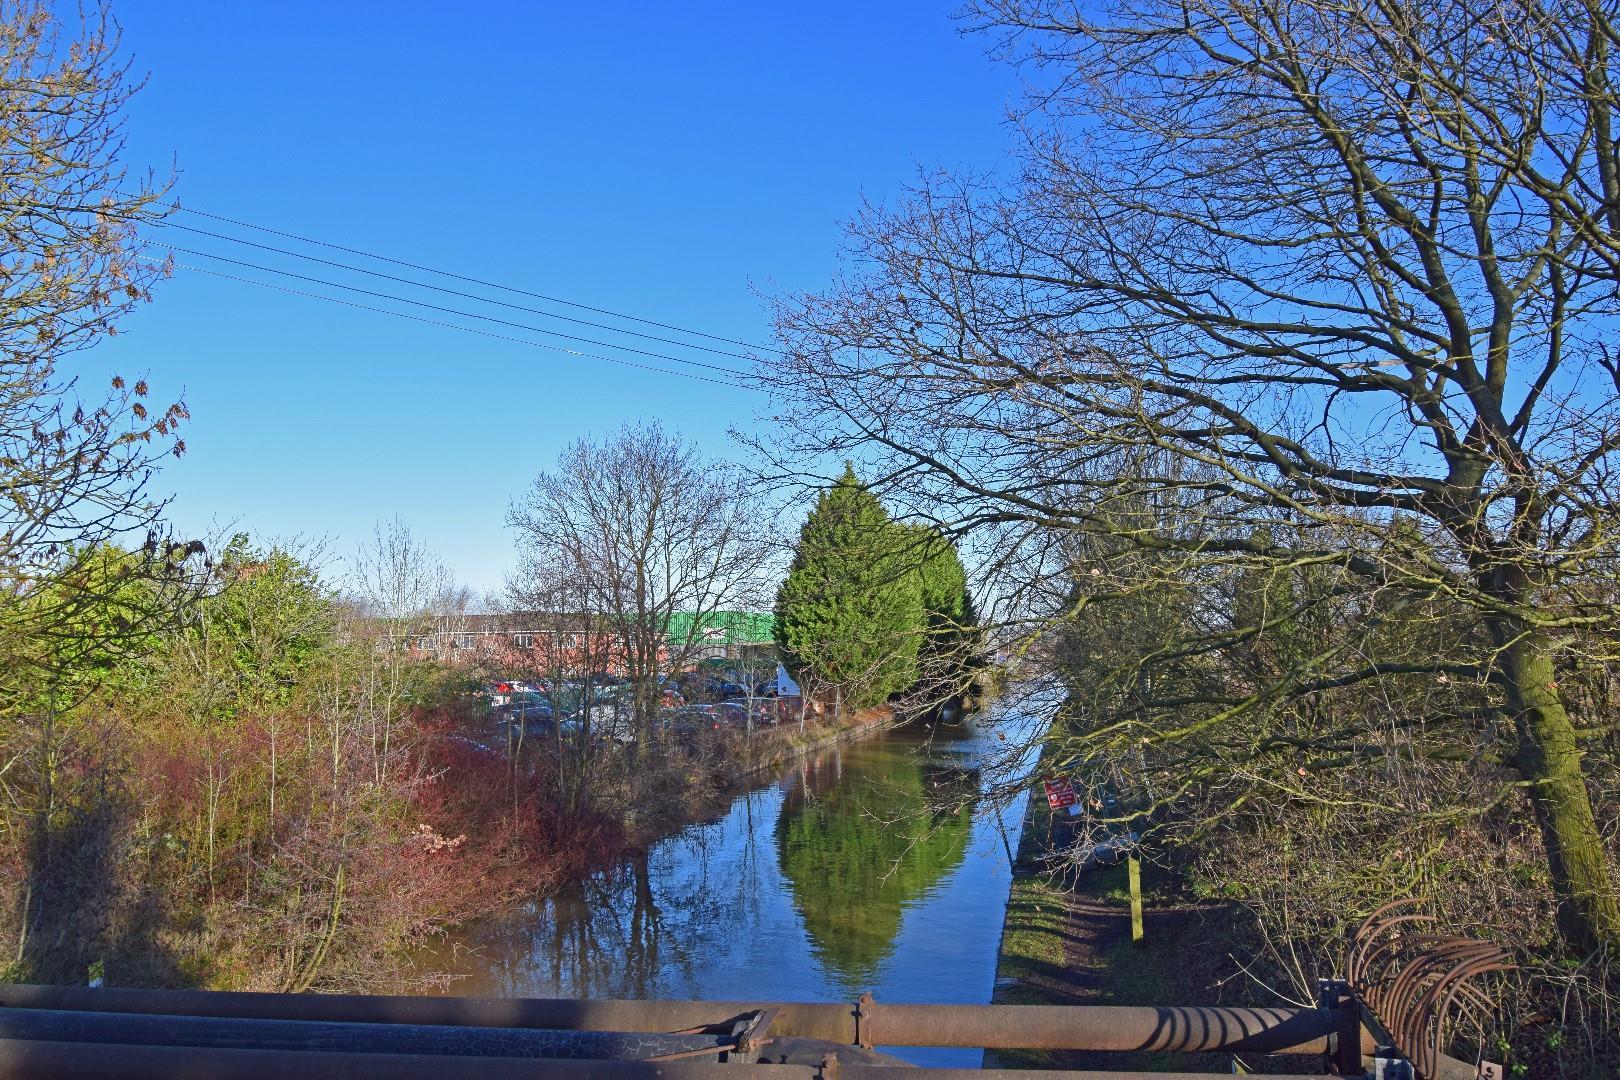 Brine Pump House Site, Weston Hall Road, Stoke Prior, B60 4AL